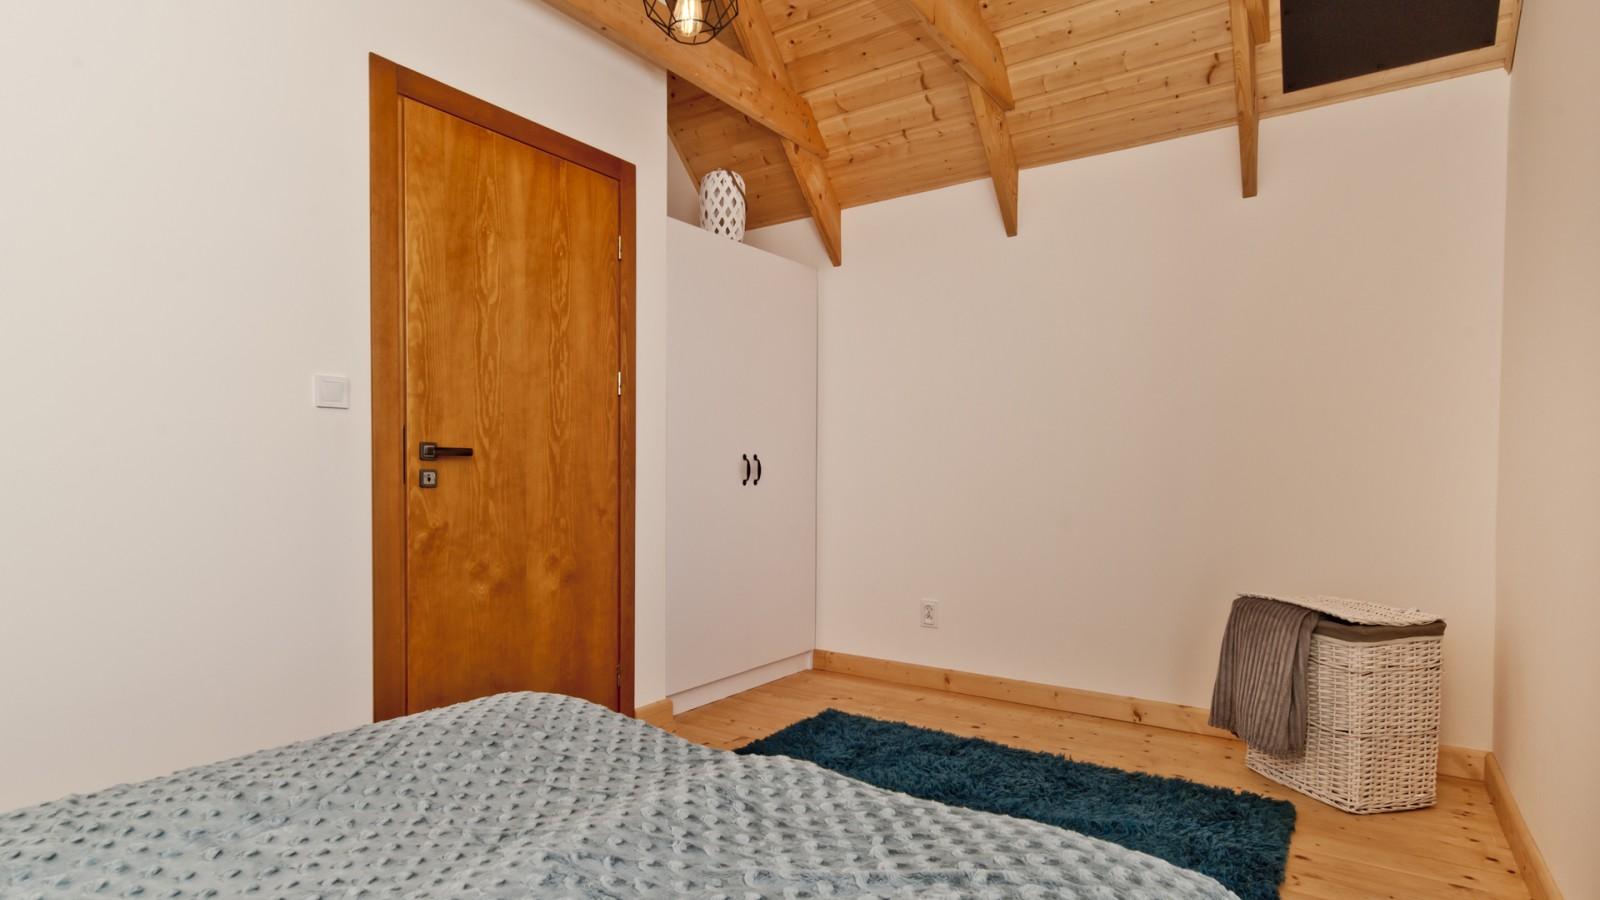 Domek Apartamentowy Scandi 5